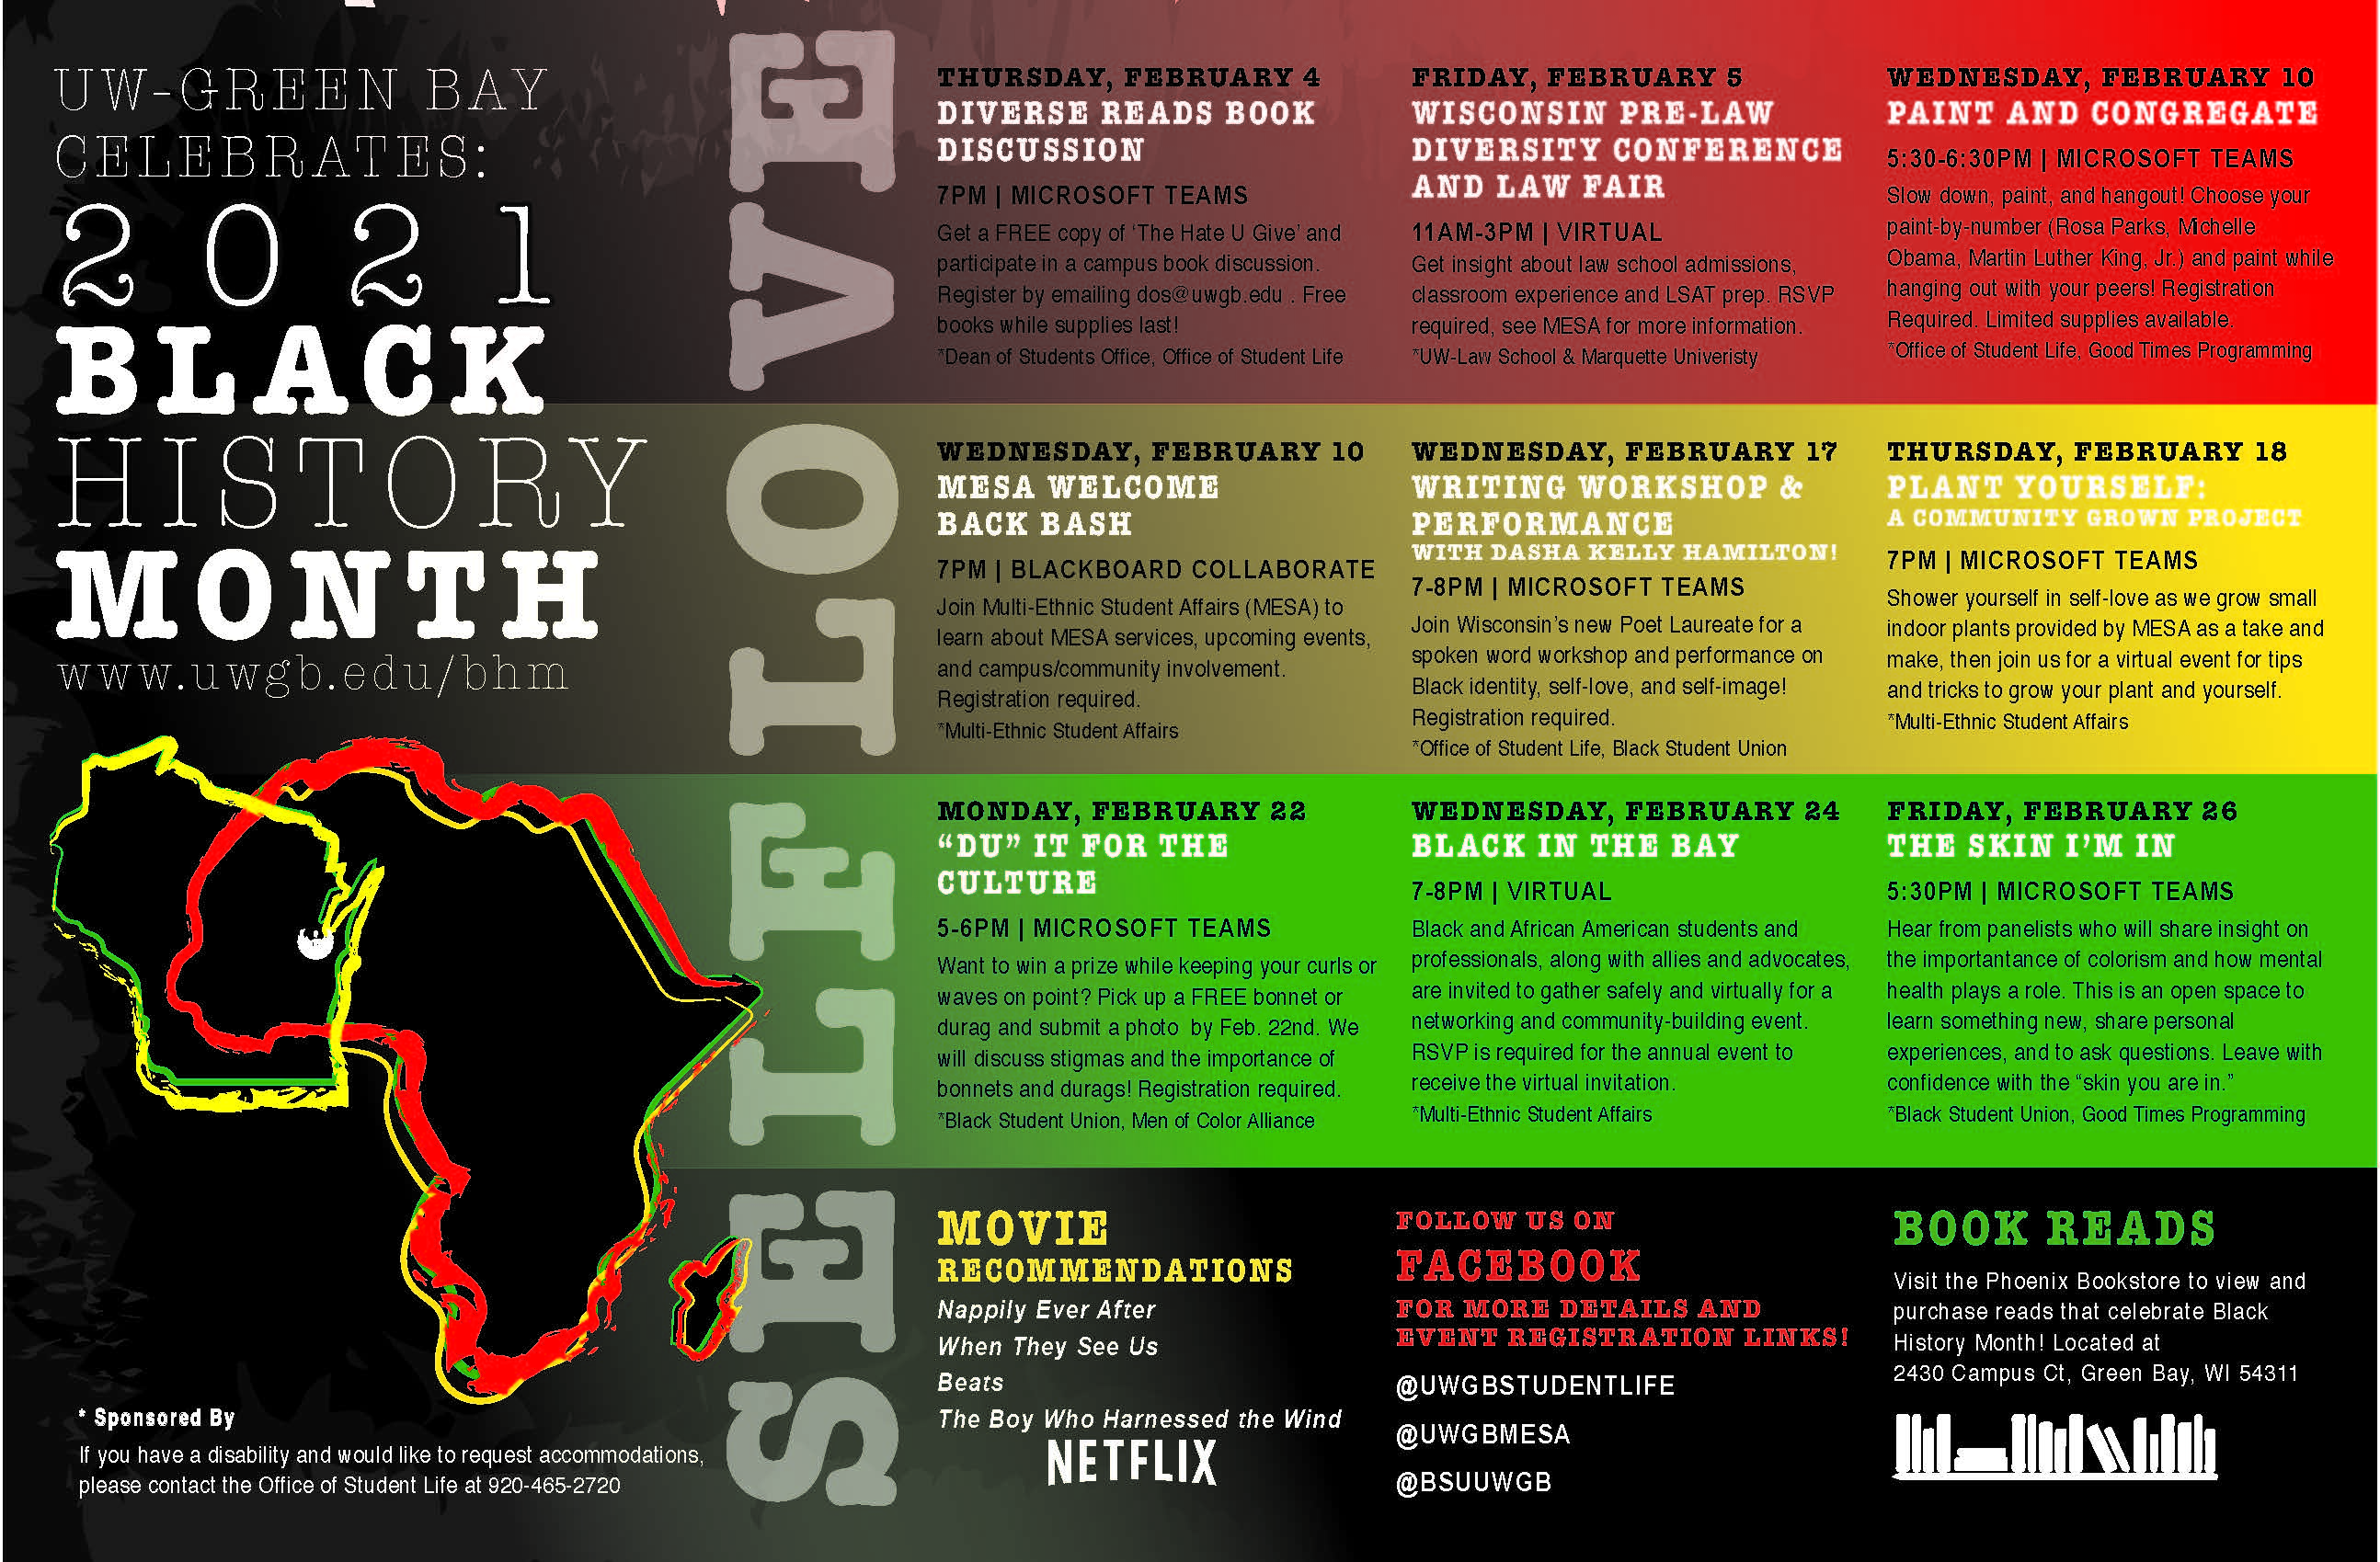 Black History Month UWGB Poster (small)